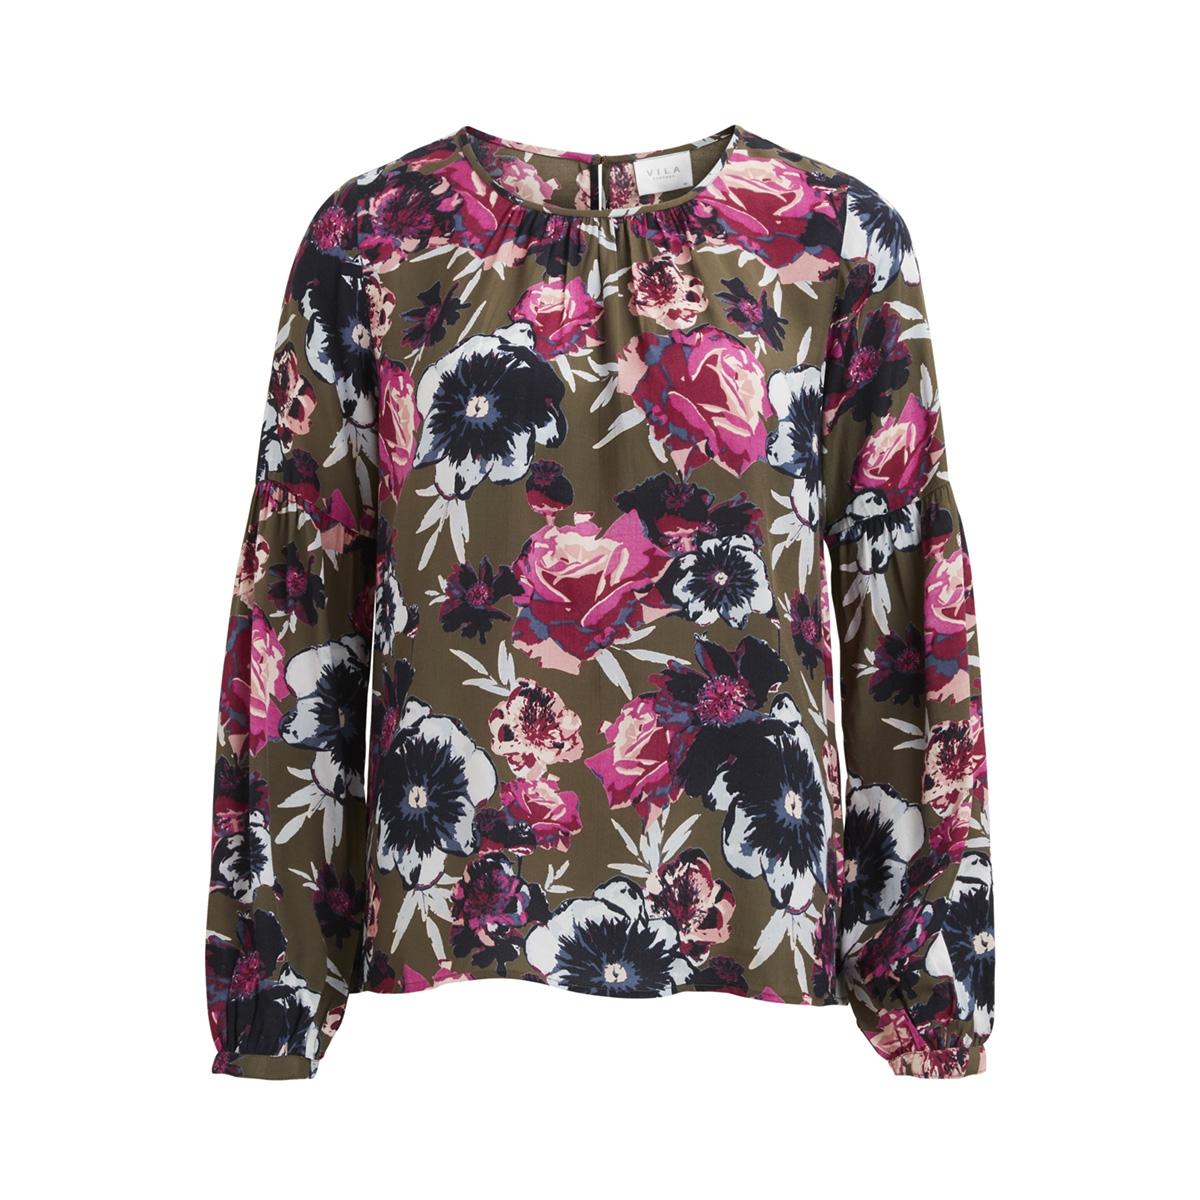 viastha l/s top 14044806 vila blouse ivy green/ivy green